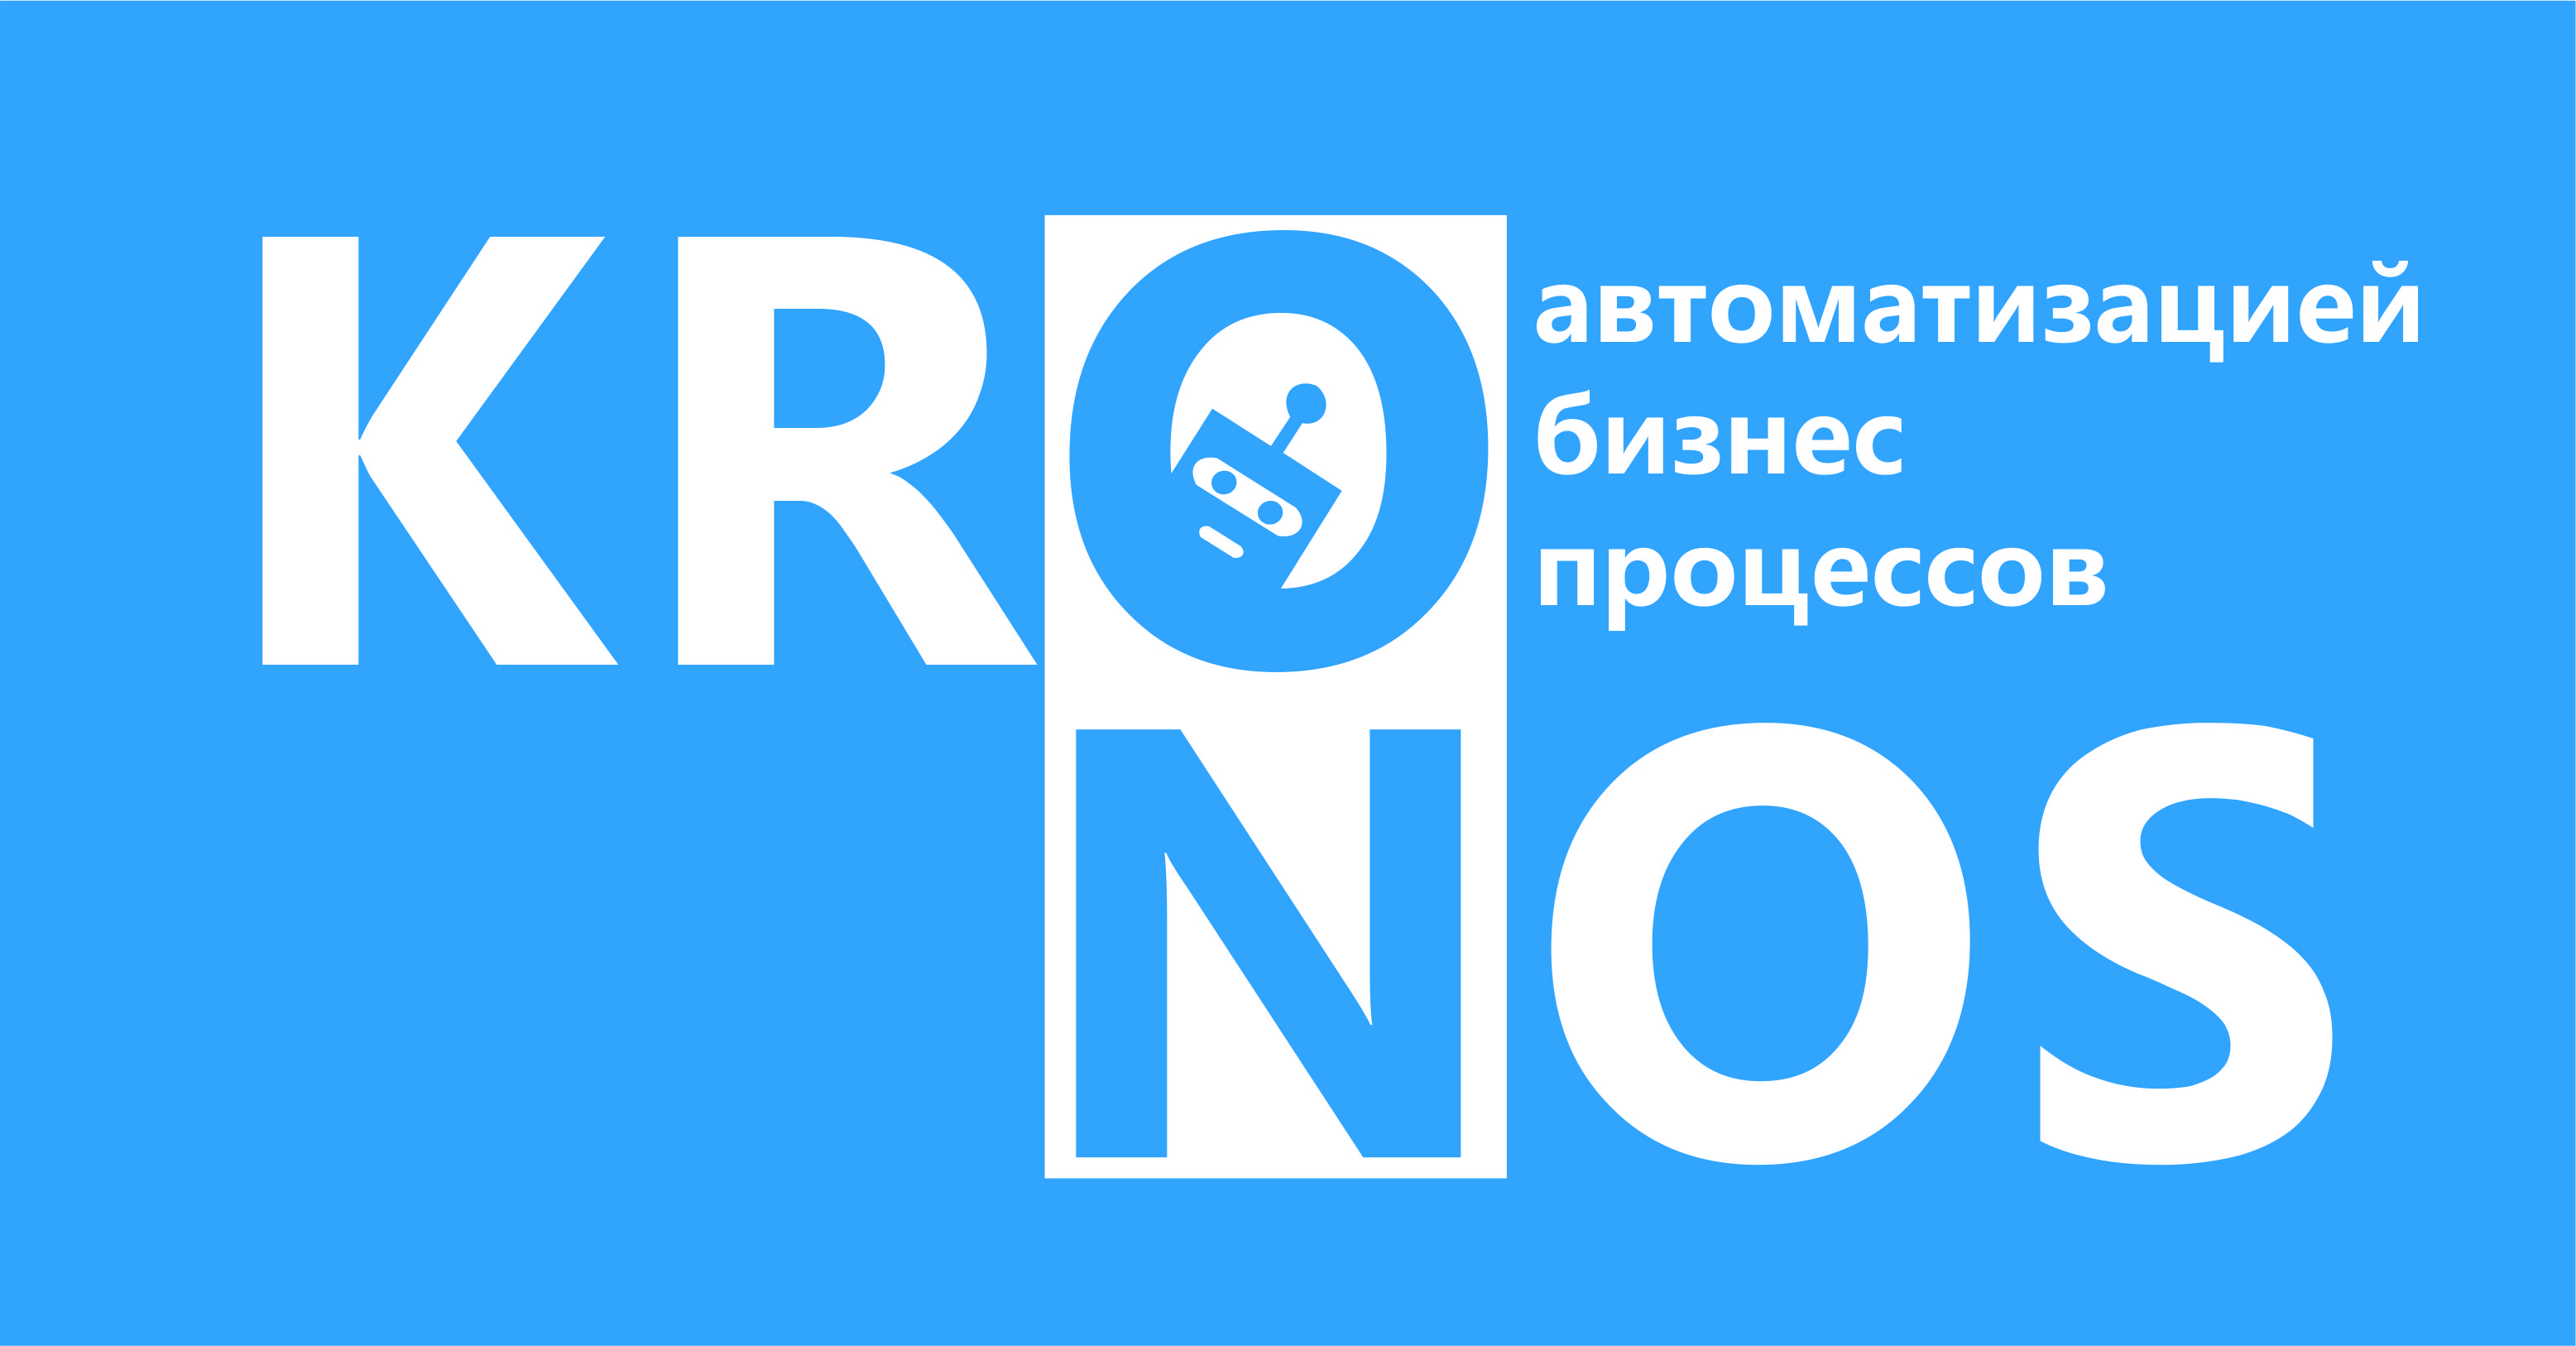 Разработать логотип KRONOS фото f_3425fafed8819f80.jpg